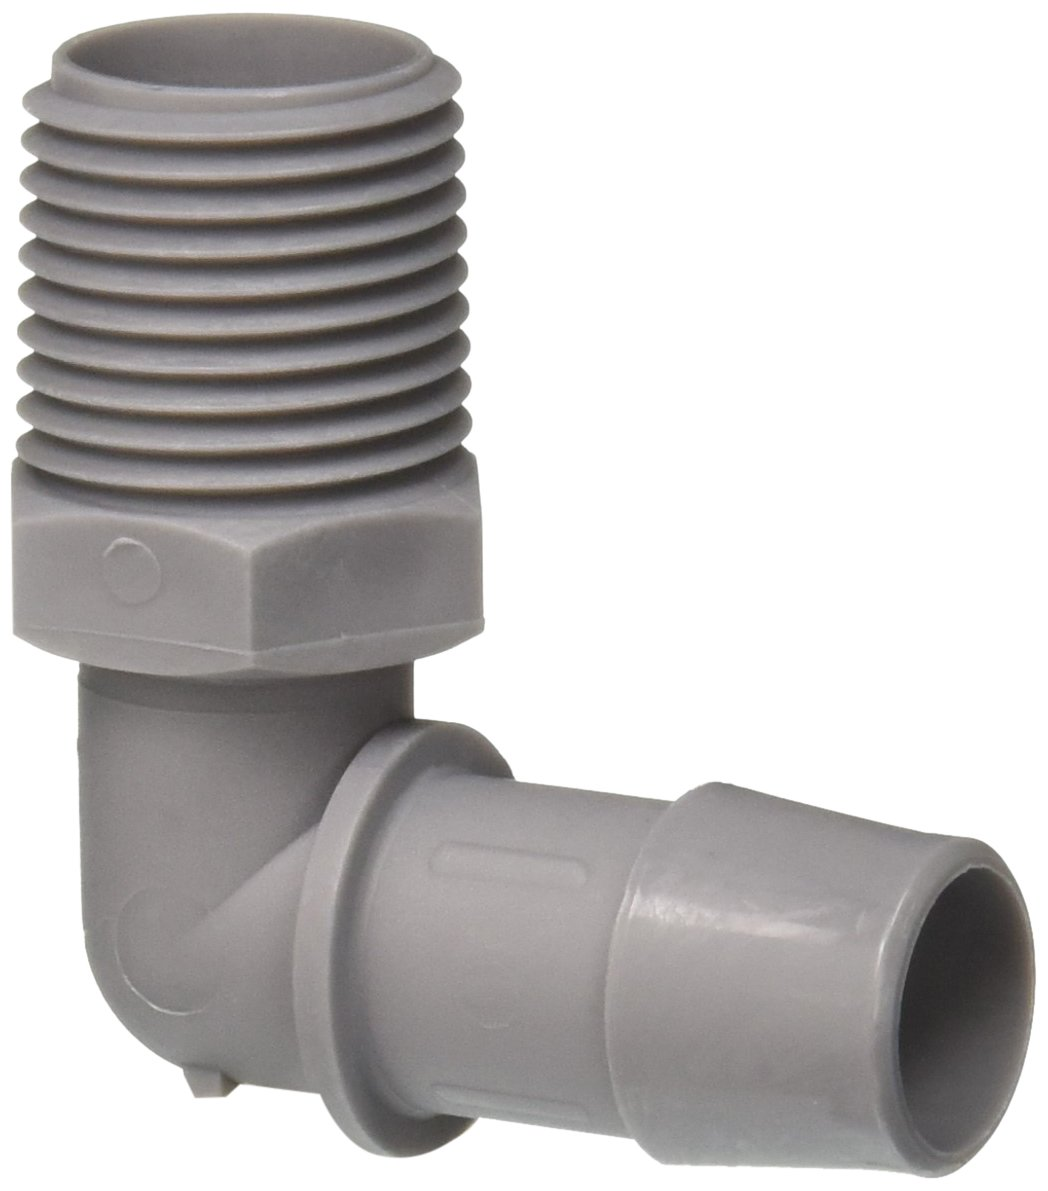 1//2-14 npt Thread Eldon James Adapter 3//8 in hose Thread to Barb lot of 6